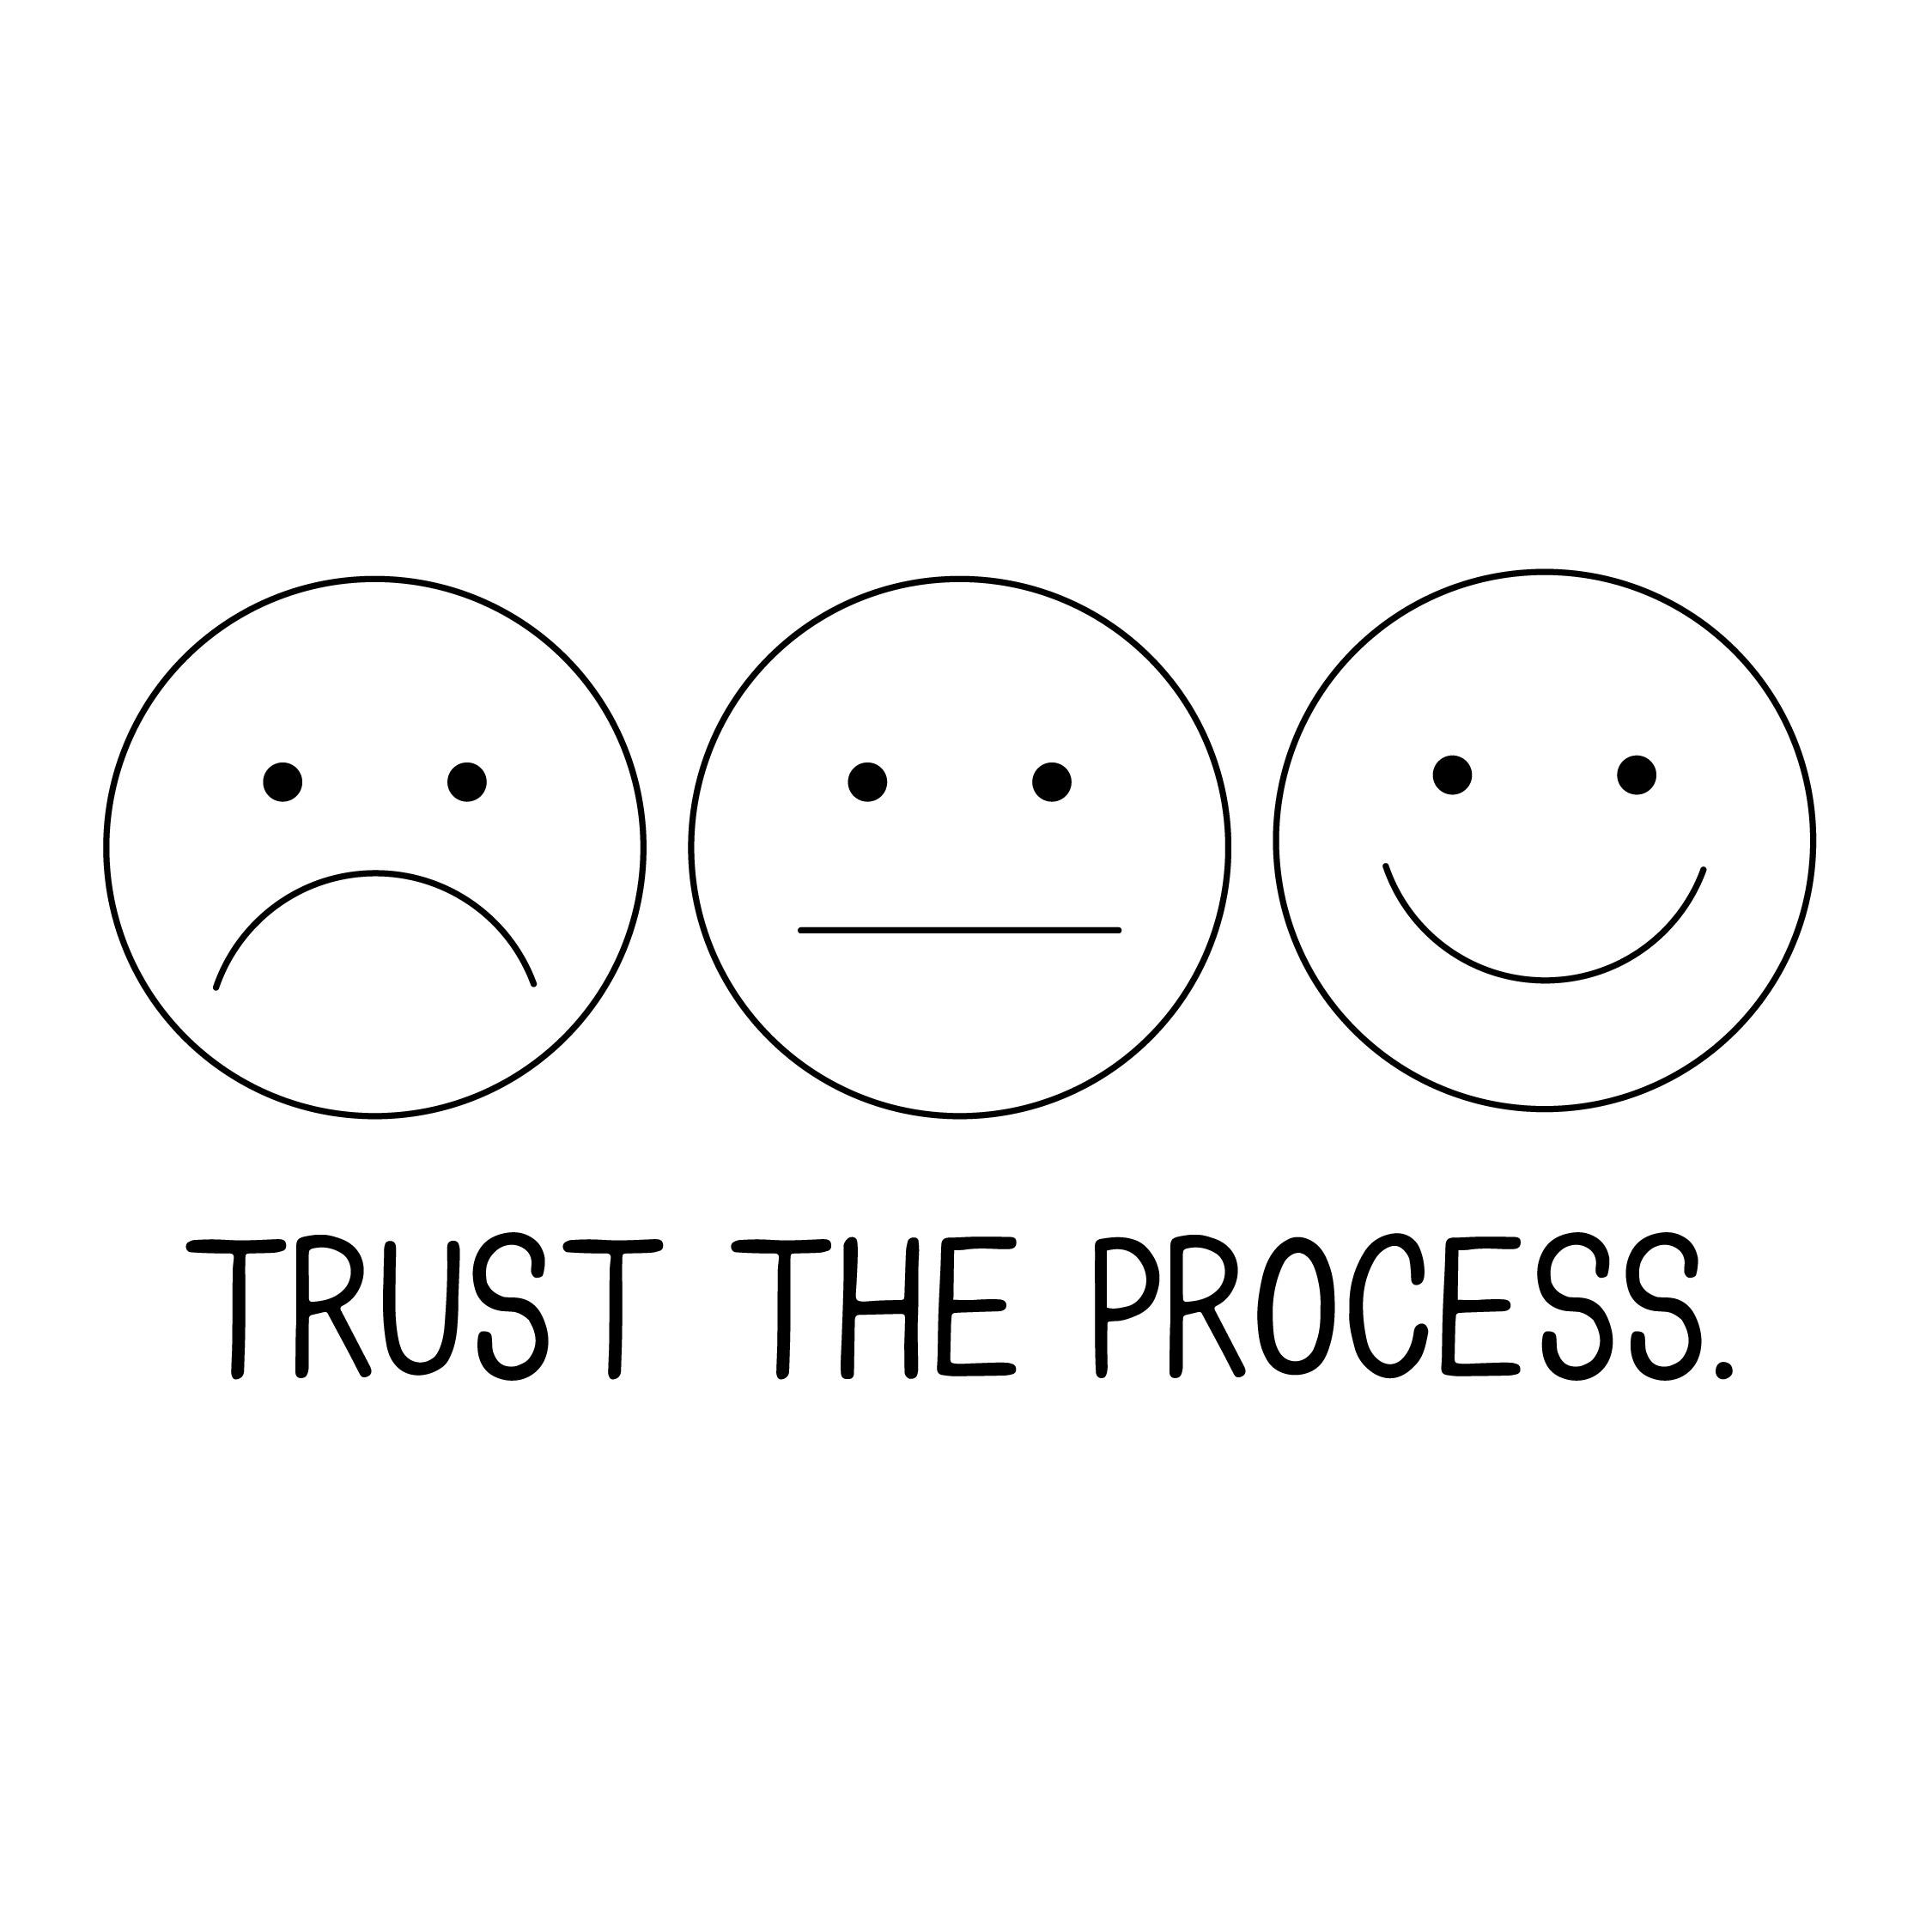 trusttheprocess-01.jpg